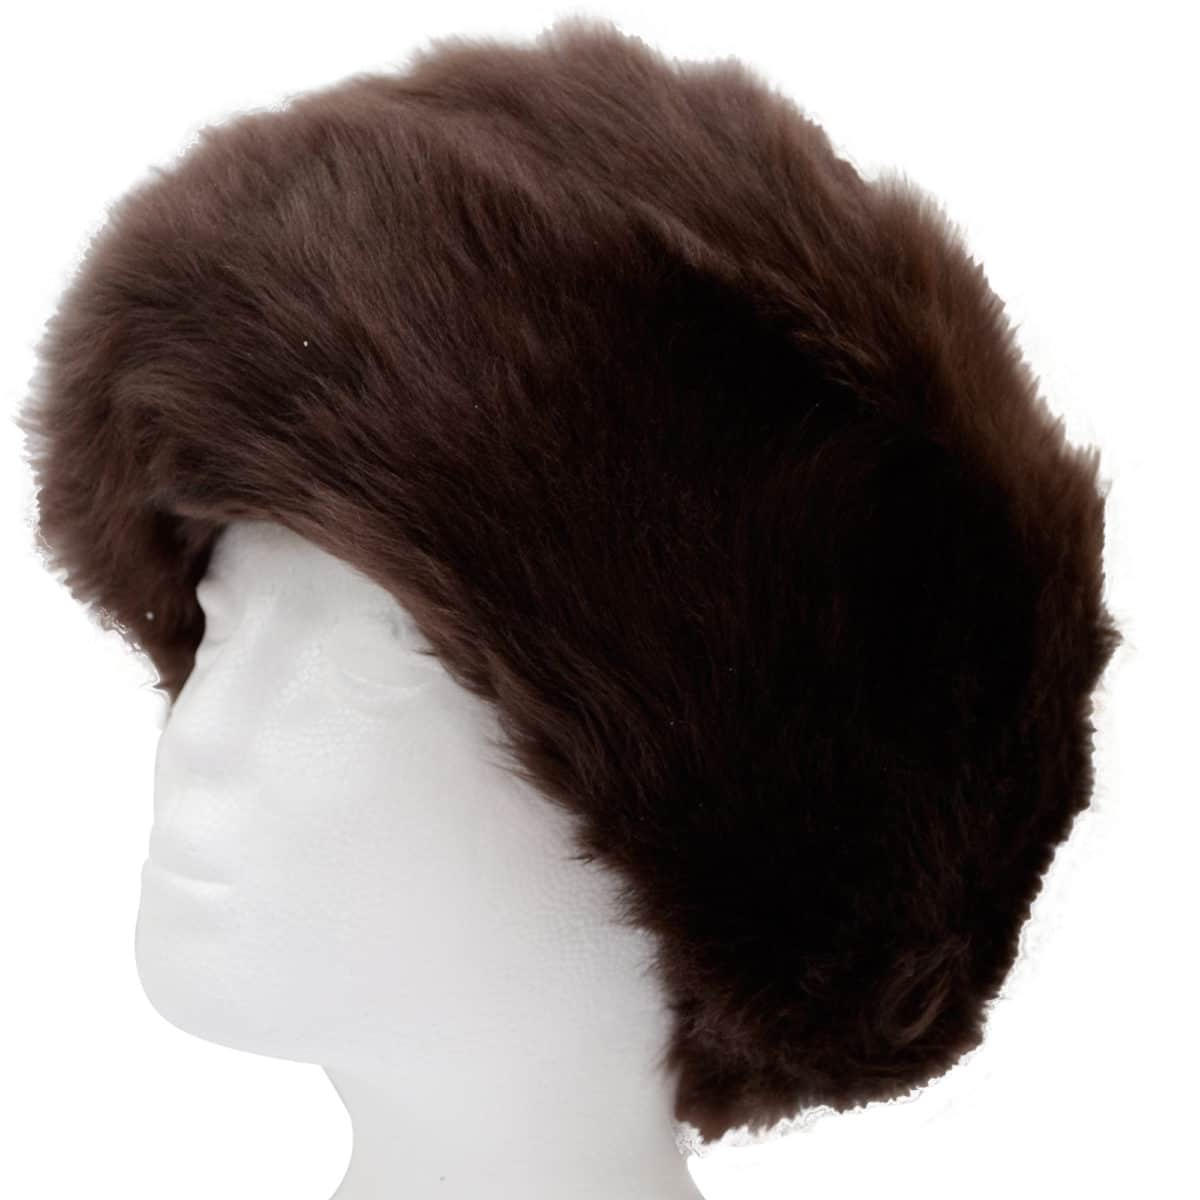 Fern - Ladies Full Sheepskin Hat - Brown